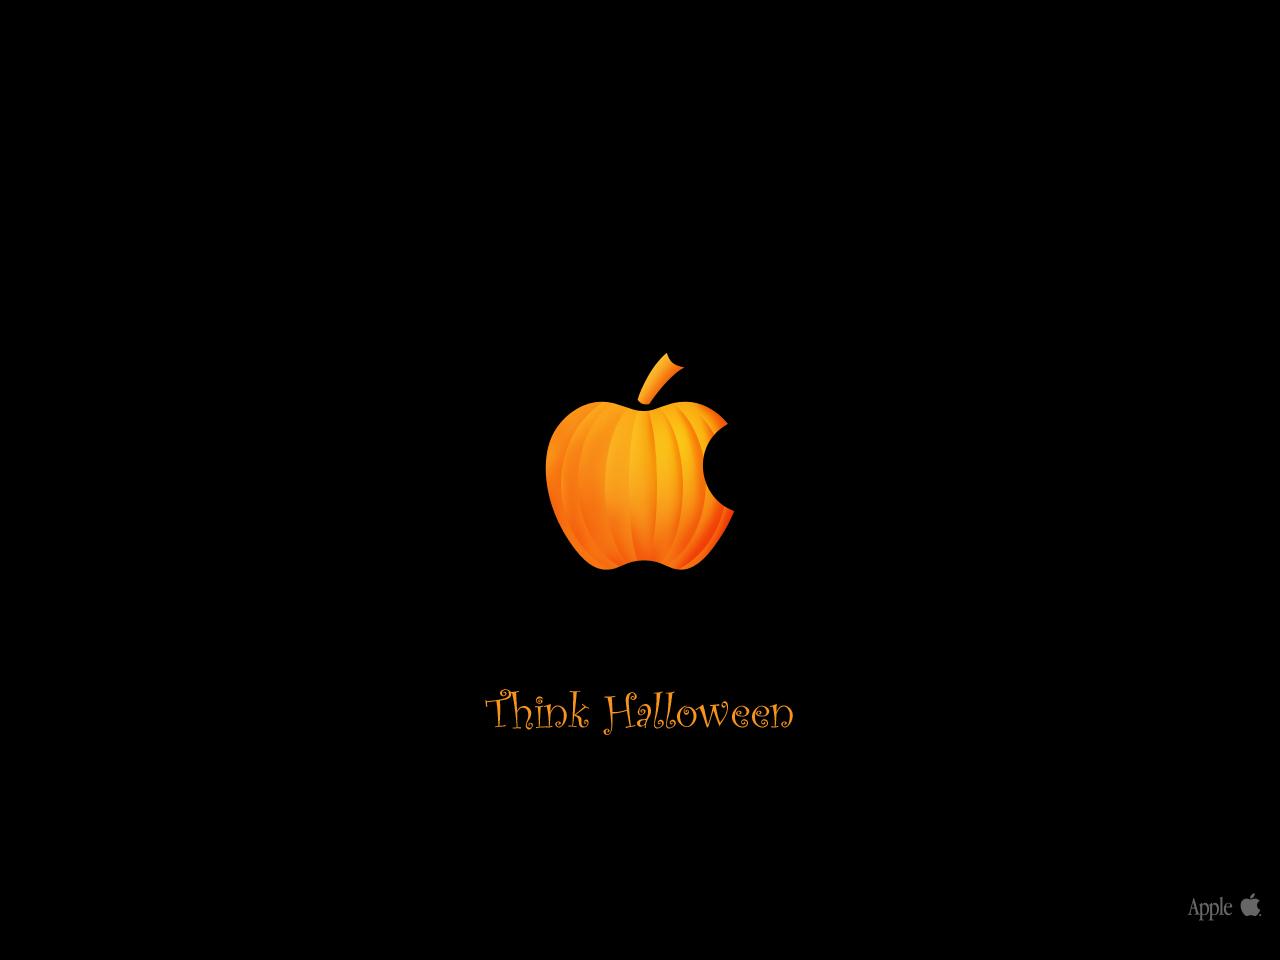 Cool Halloween Wallpaper - WallpaperSafari